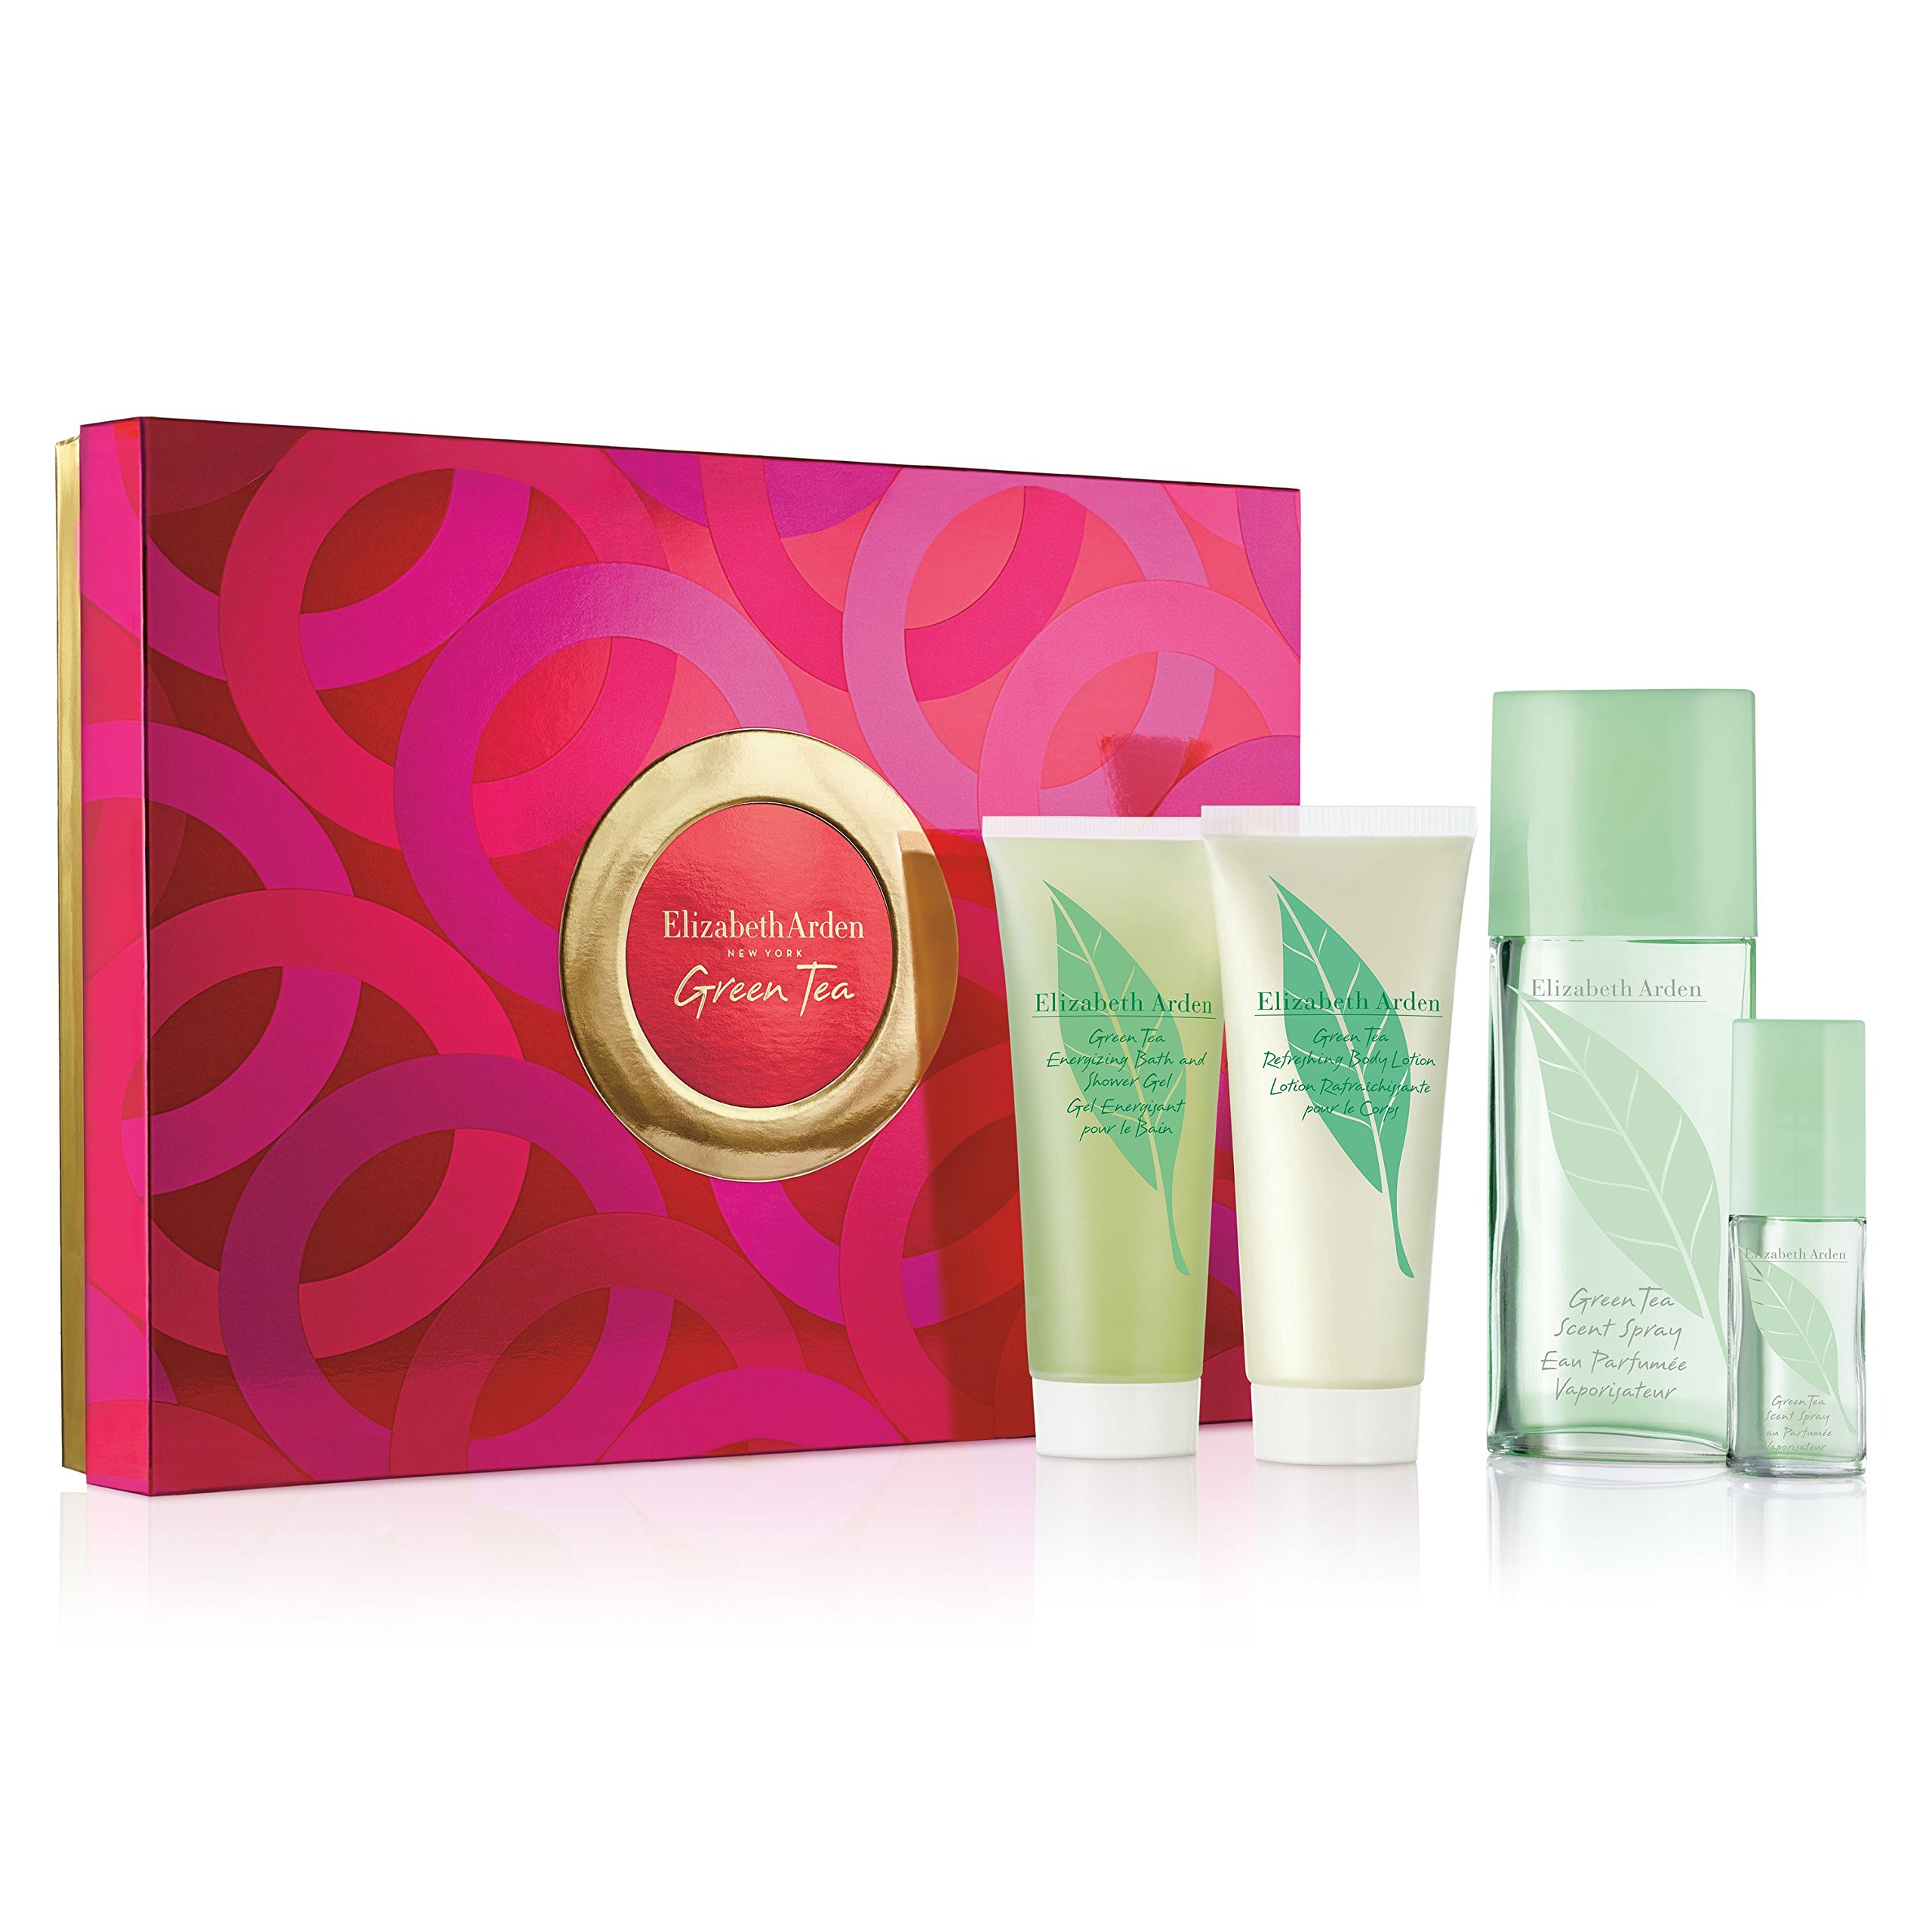 Elizabeth Arden Green Tea 4 Piece Value Fragrance Set by Elizabeth Arden (Image #1)